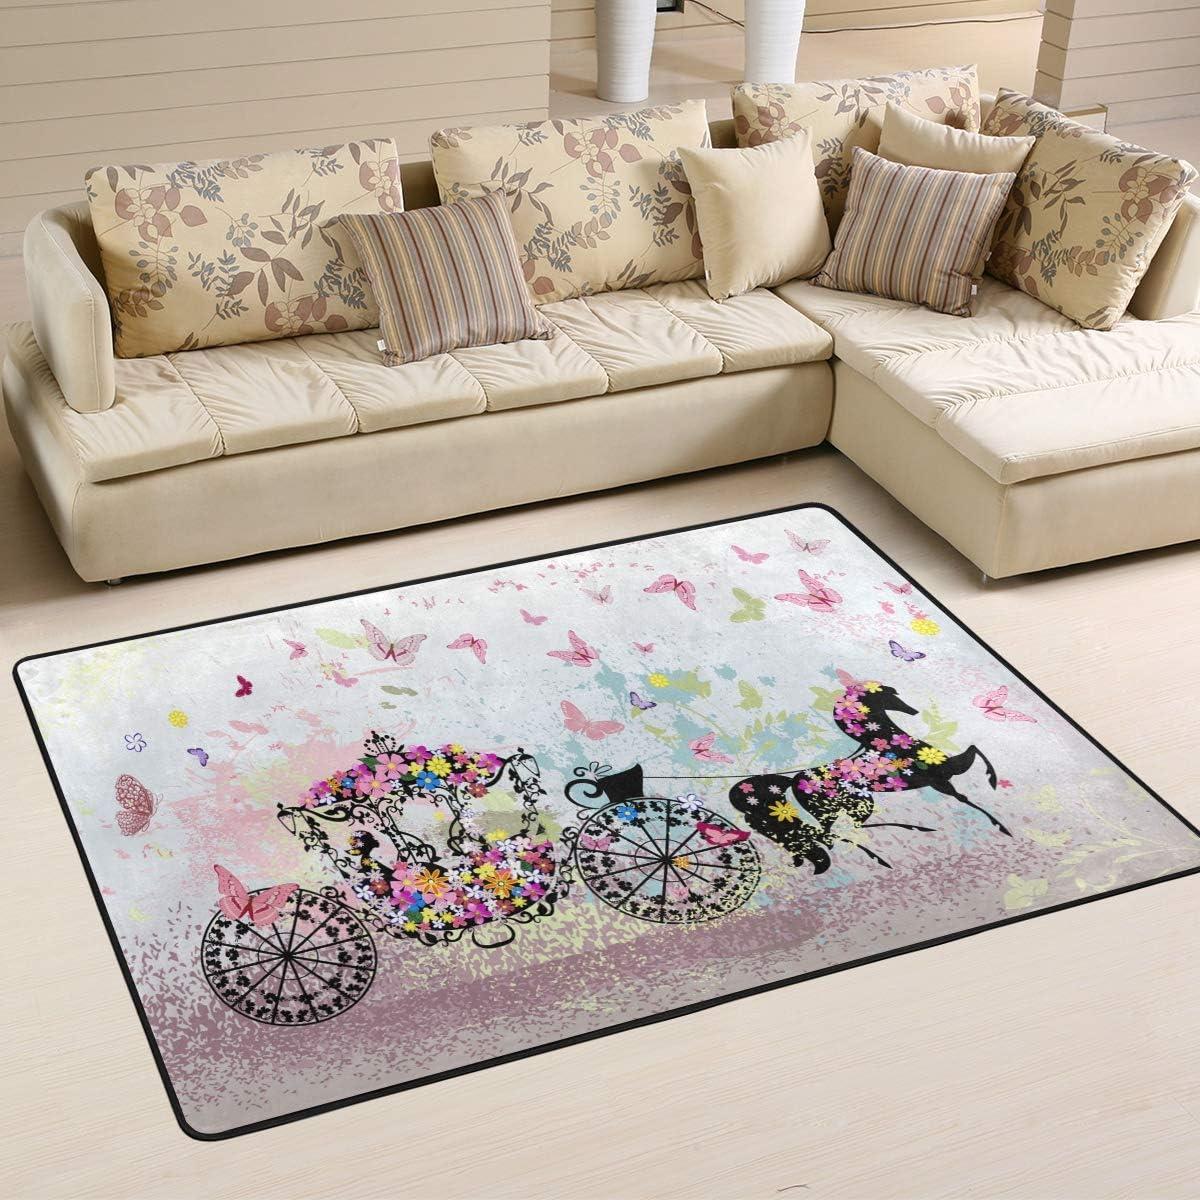 Thro by Marlo Lorenz Faux Fur Throw Pillow, 20×20 Square, Rose Smoke